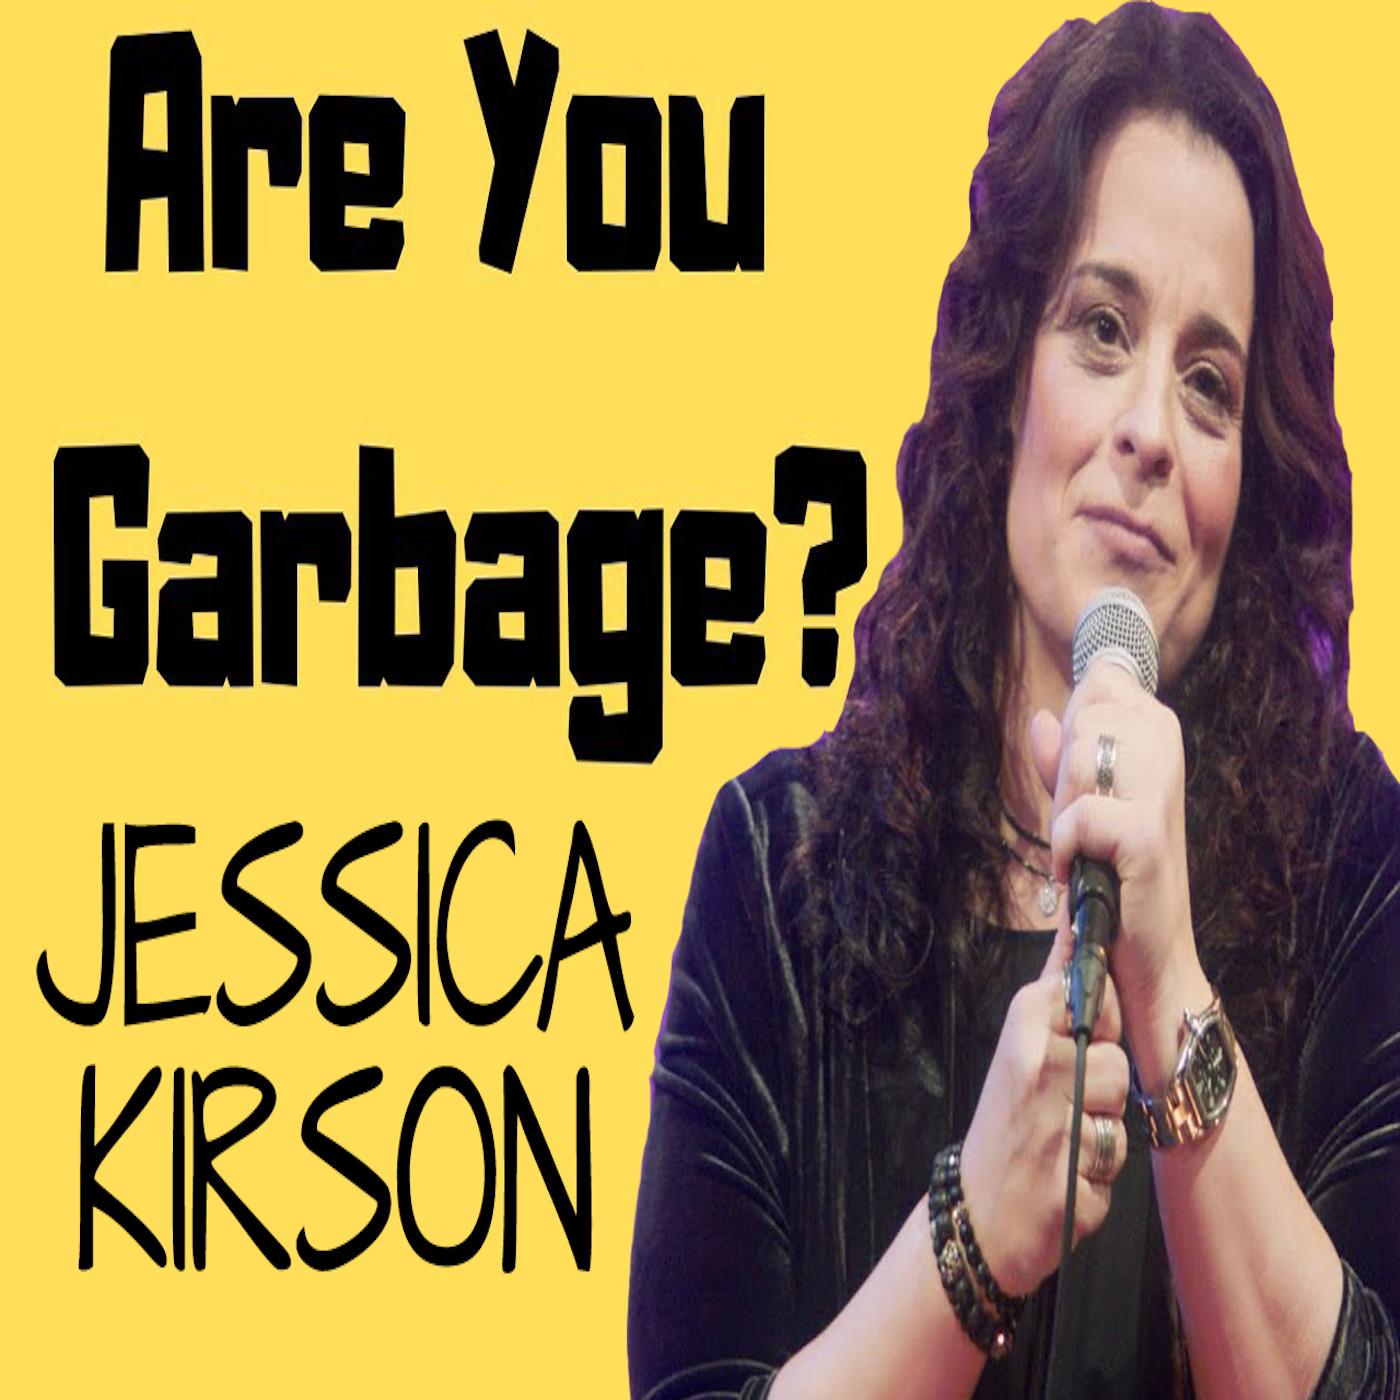 Jessica Kirson: Jersey Class